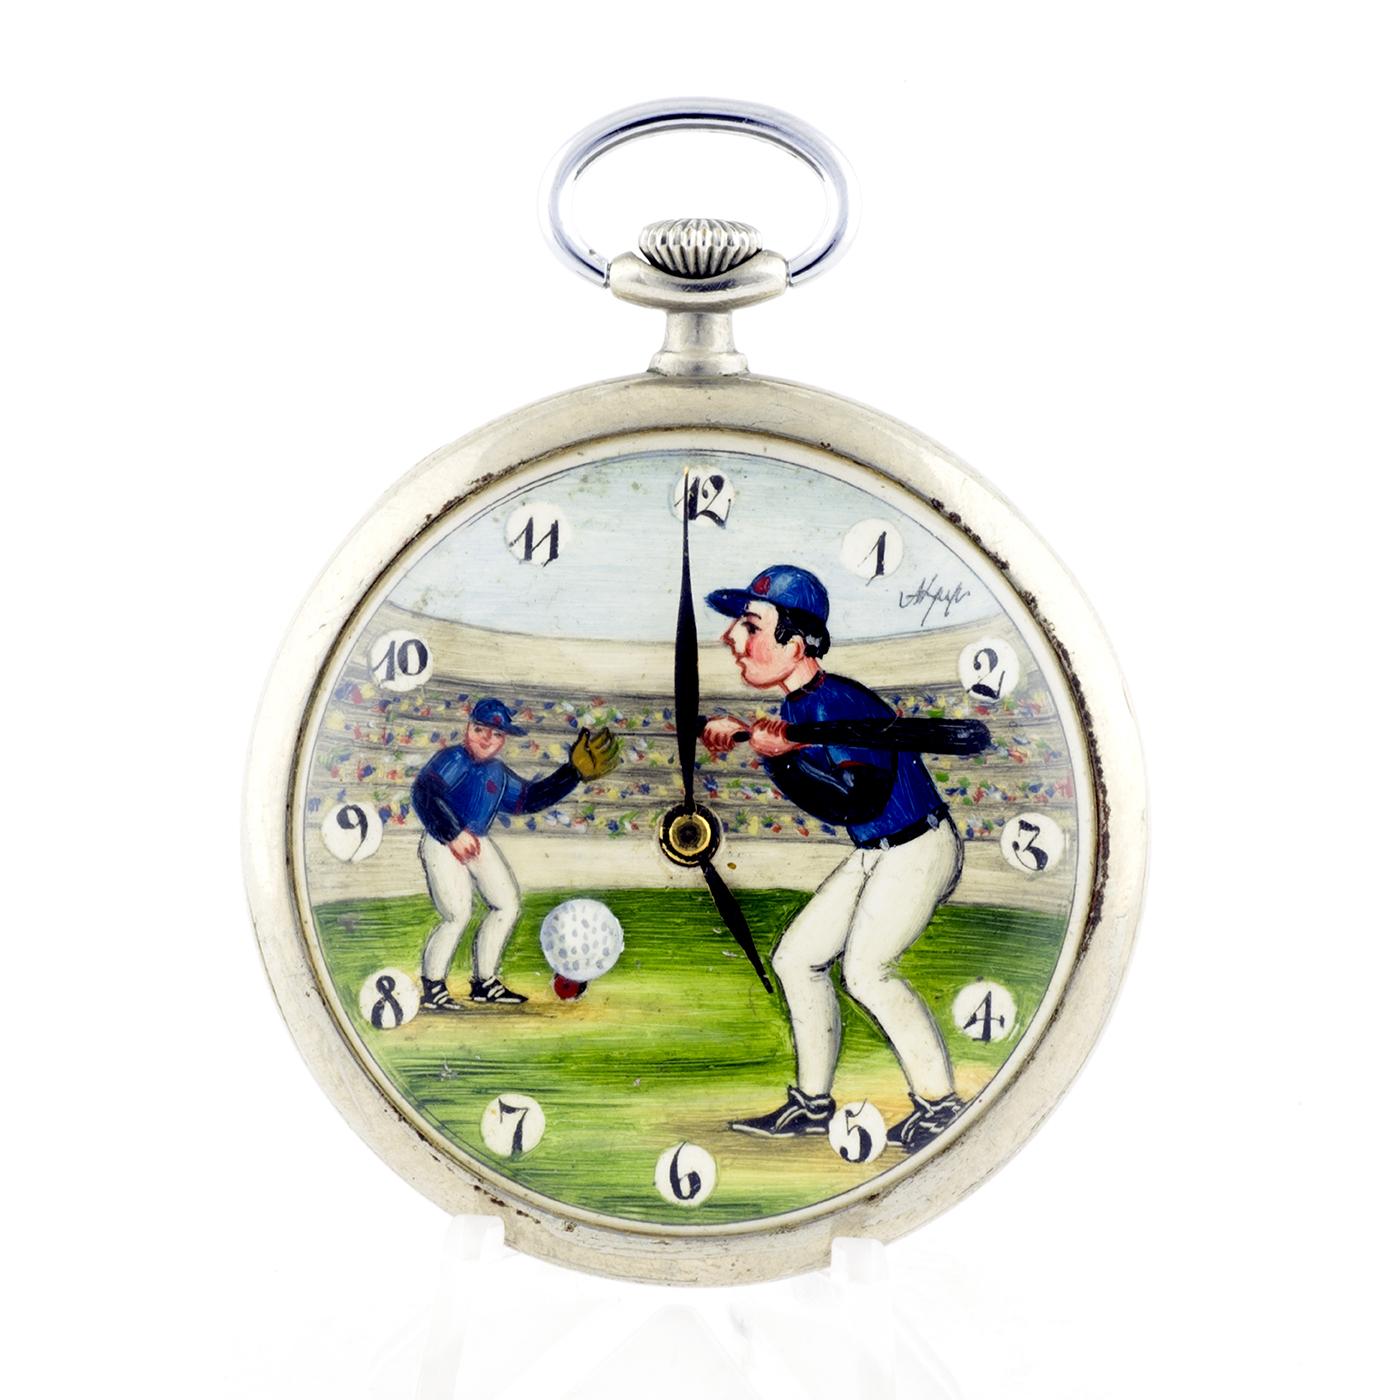 DOXA. Reloj de bolsillo, lepine y remontoir. Automatón. Pps. siglo XX.